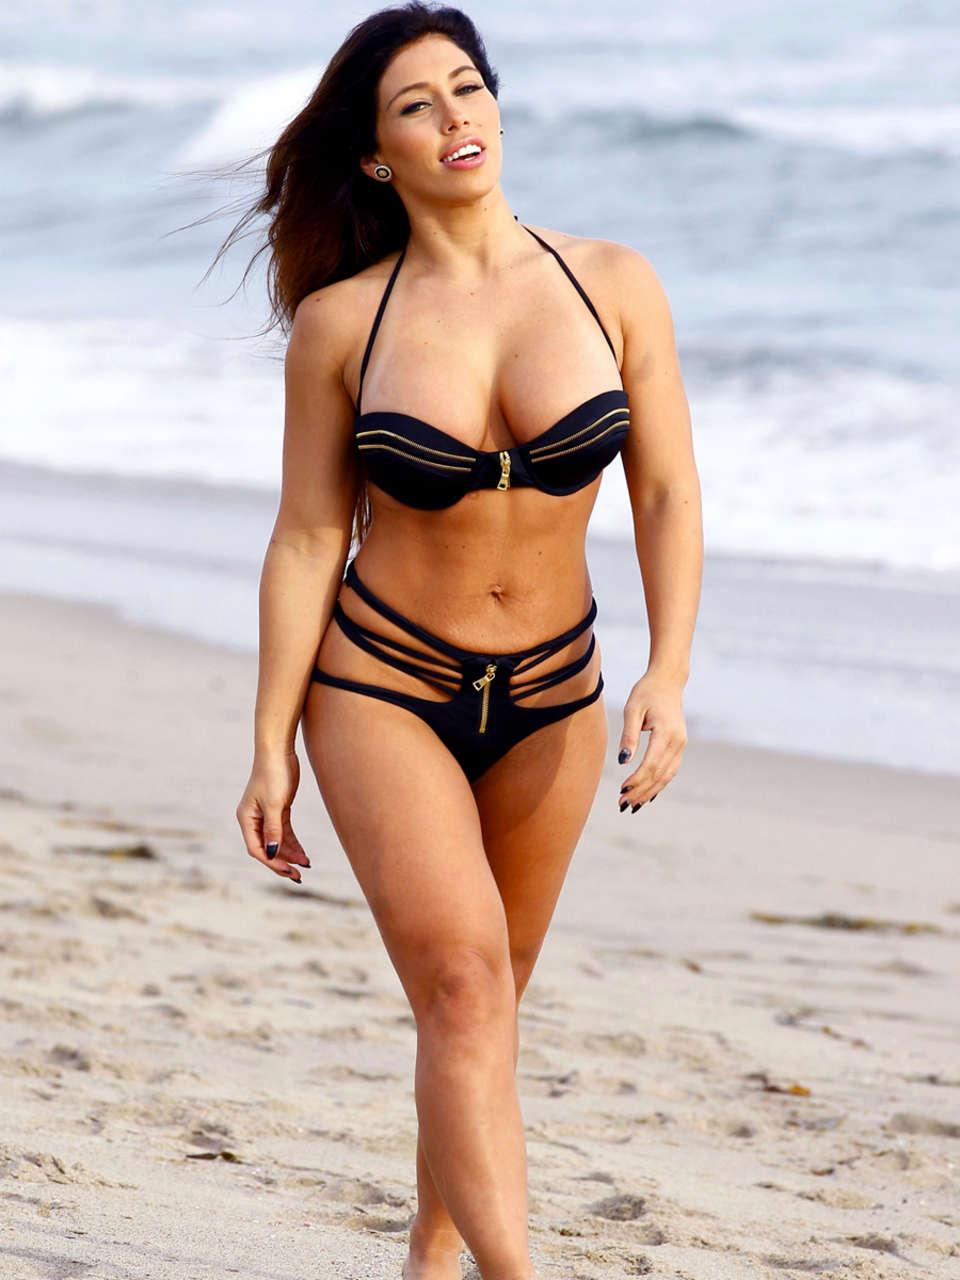 Carmen Ortega in a Bikini on the Beach in Santa Monica